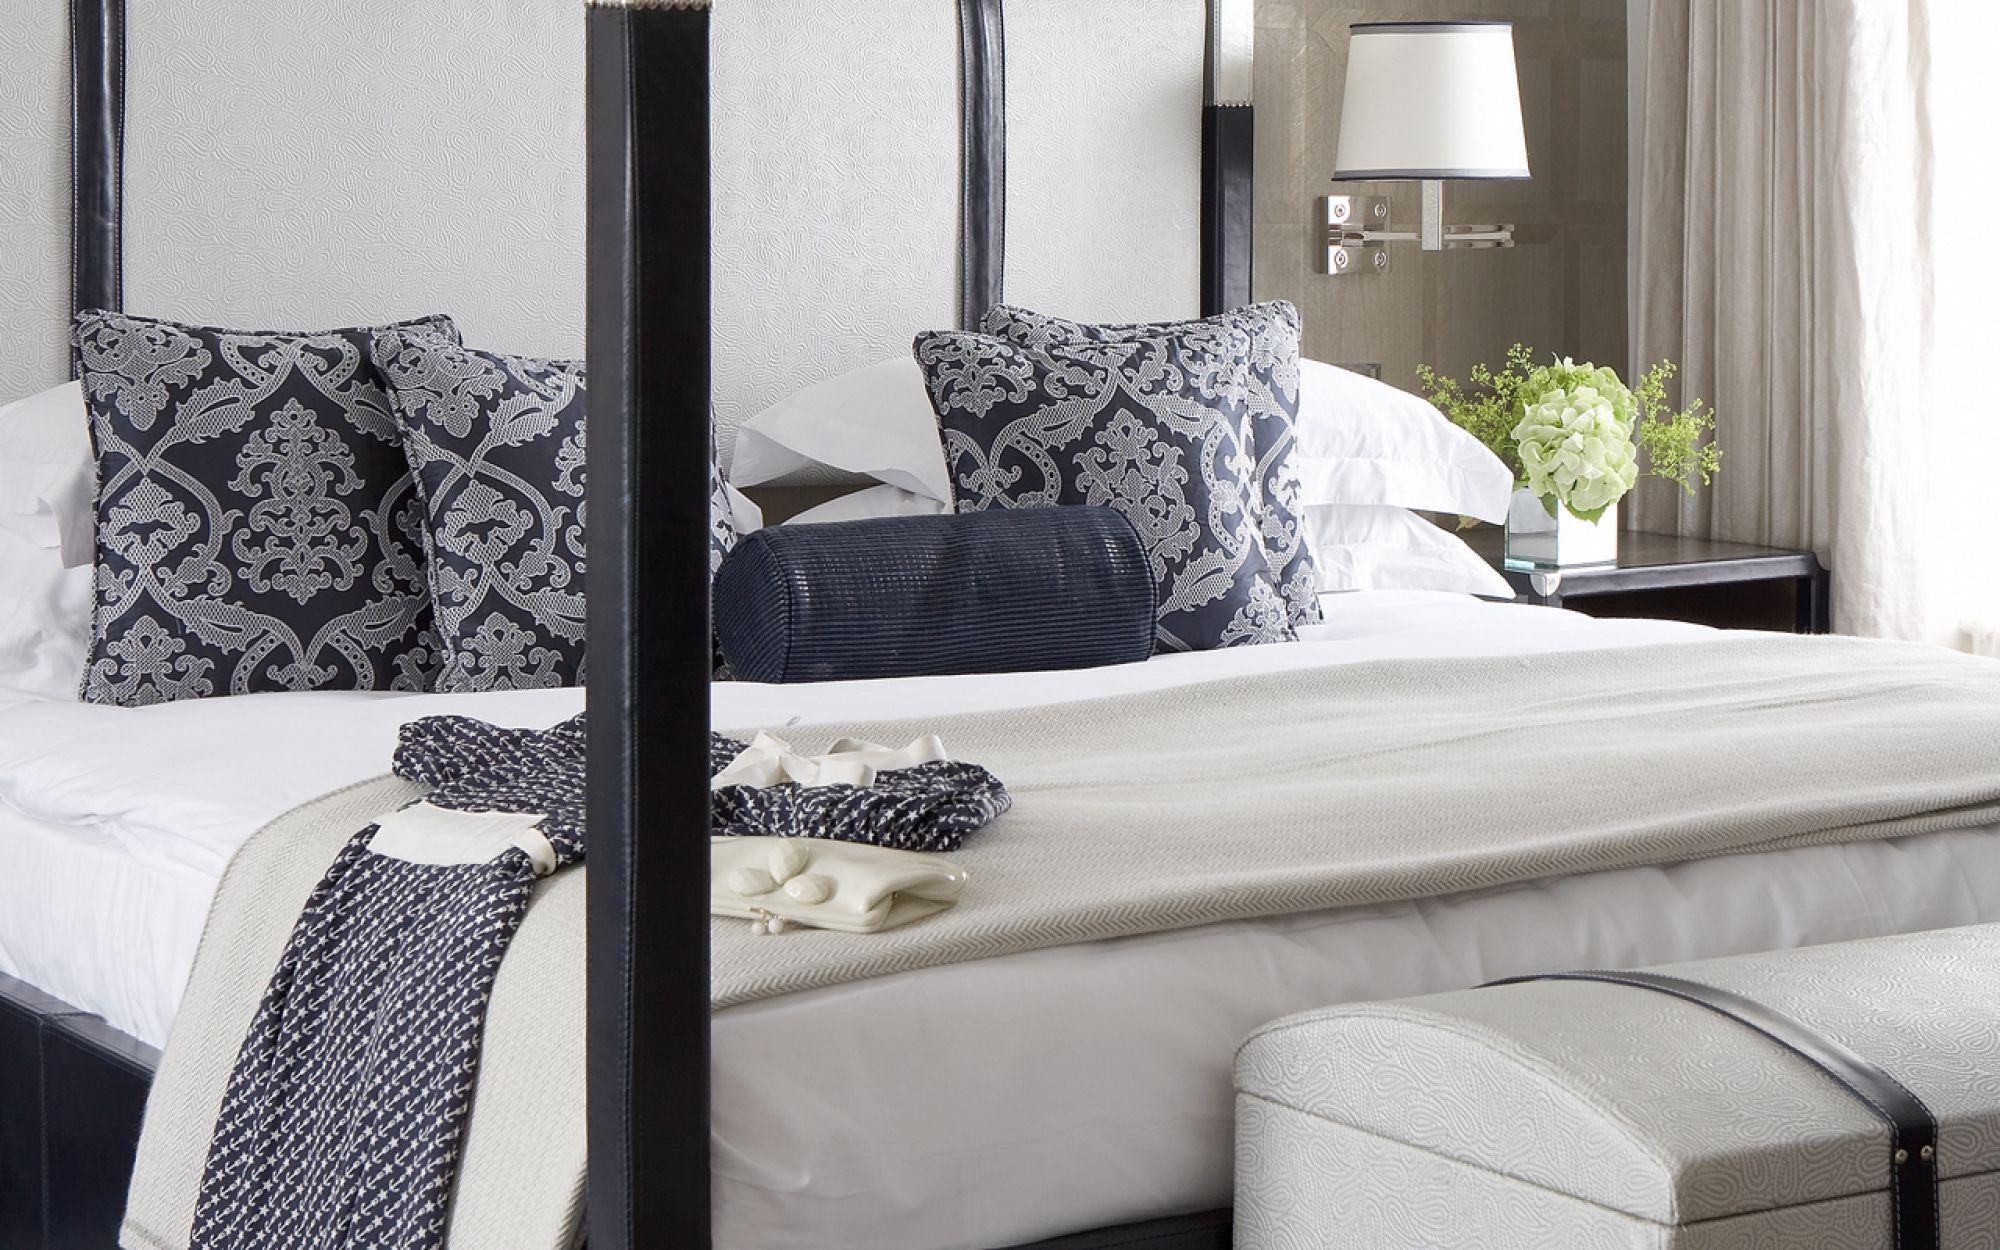 master bedroom master bedroom 10 David Collins Master Bedroom Ideas 392e6b3d6587912ae4dd7b388a33b79e